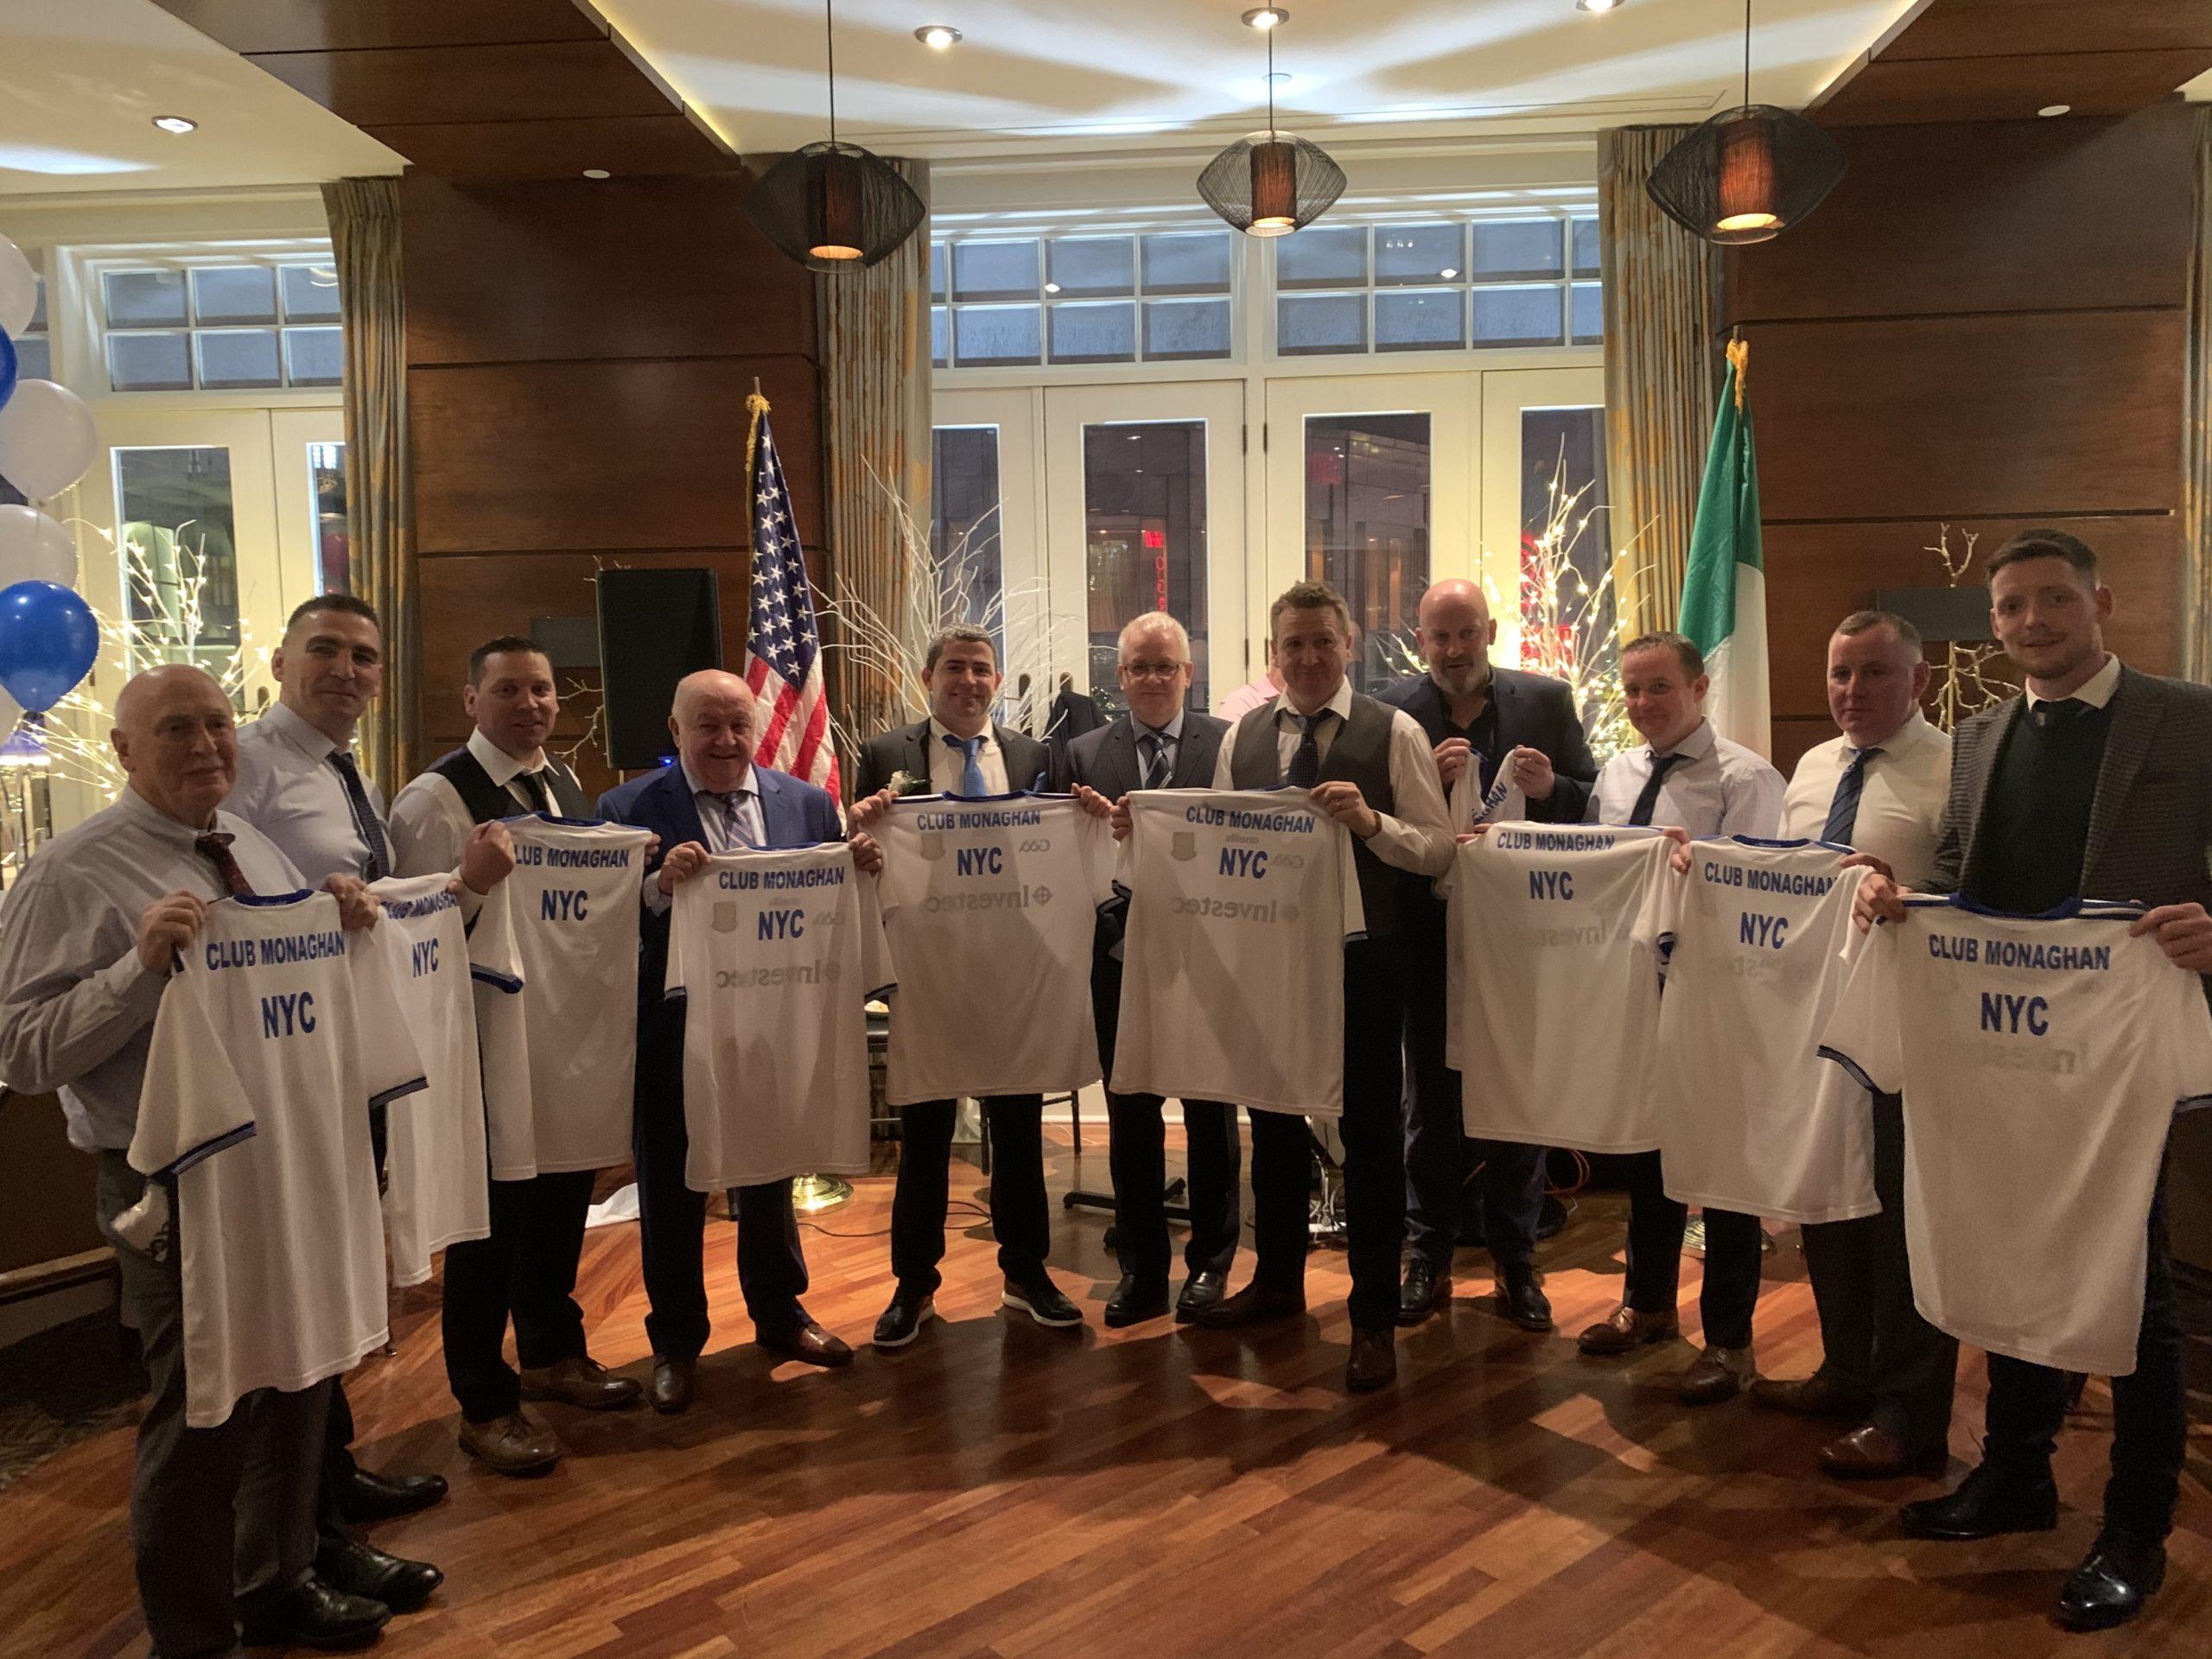 Monaghan GAA announce New 2nd Tier Sponsor Club Monaghan NYC.